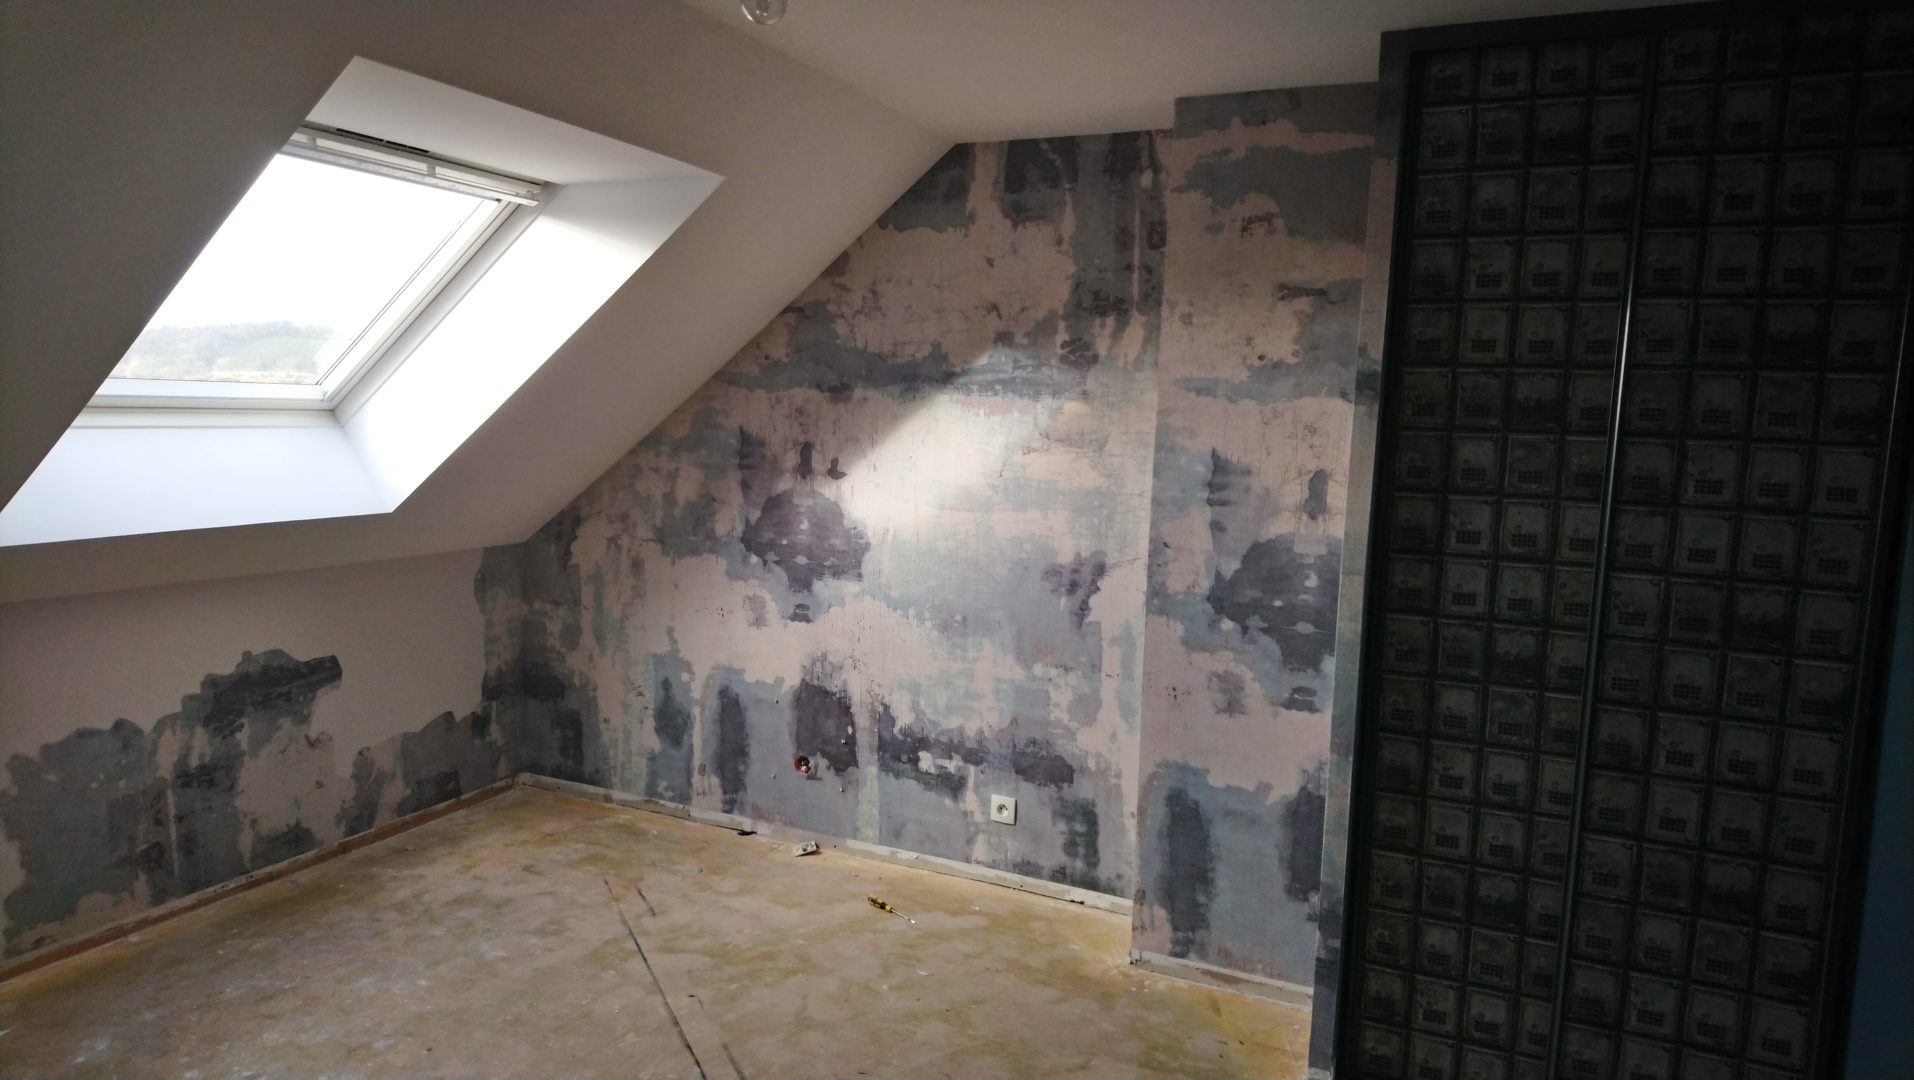 Kerfunten chambre decoration papier peint effet beto 8 - Décoration papier peint